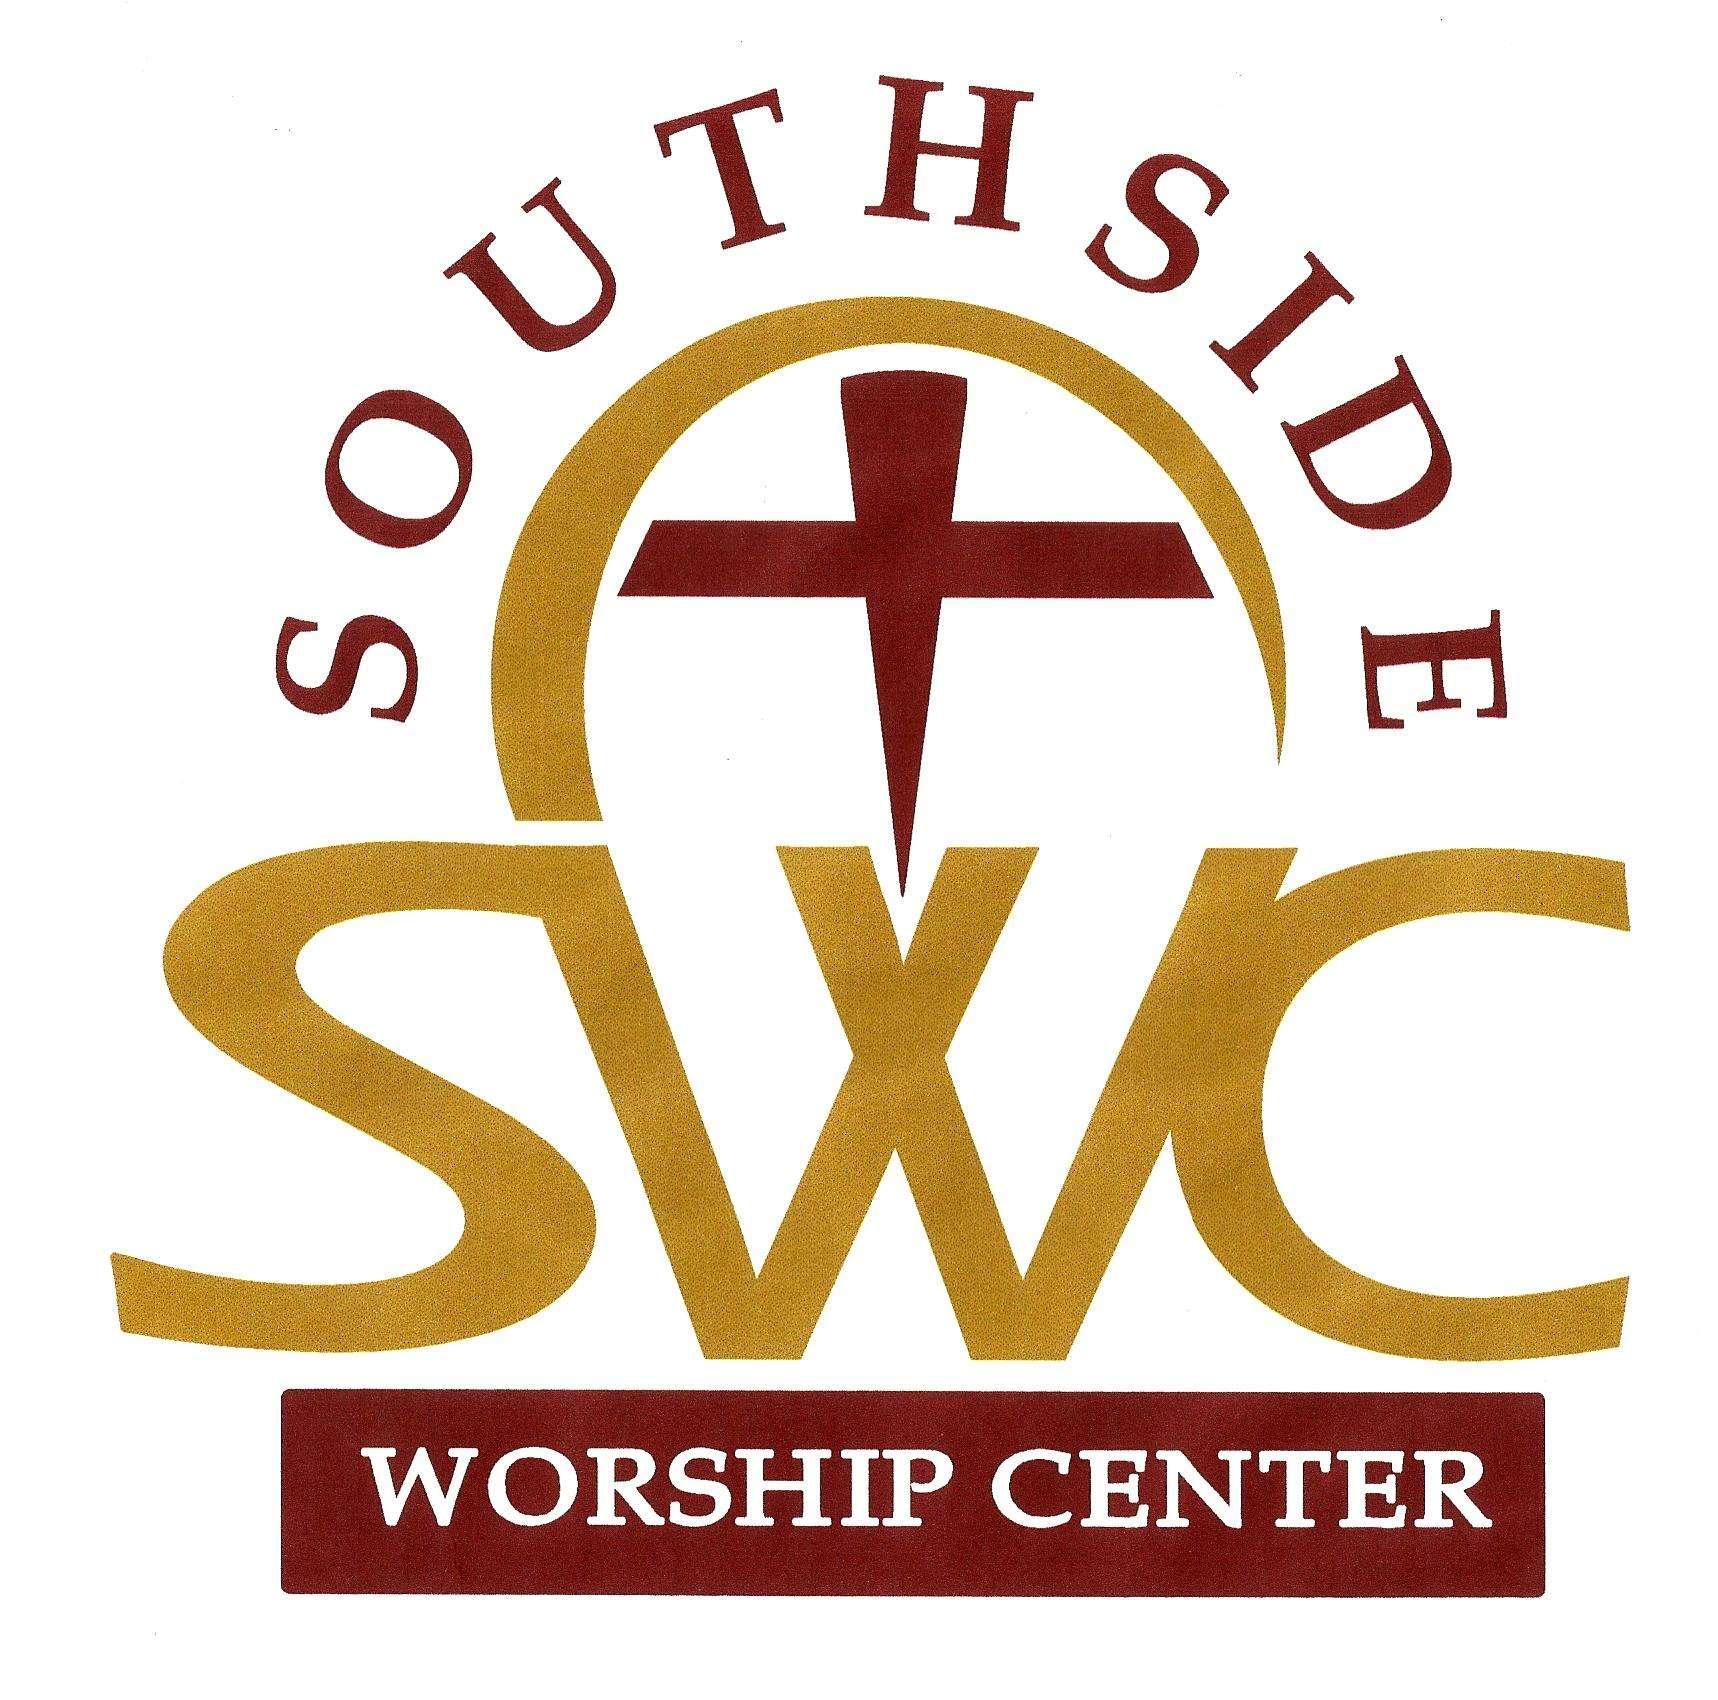 SSWC Chicago